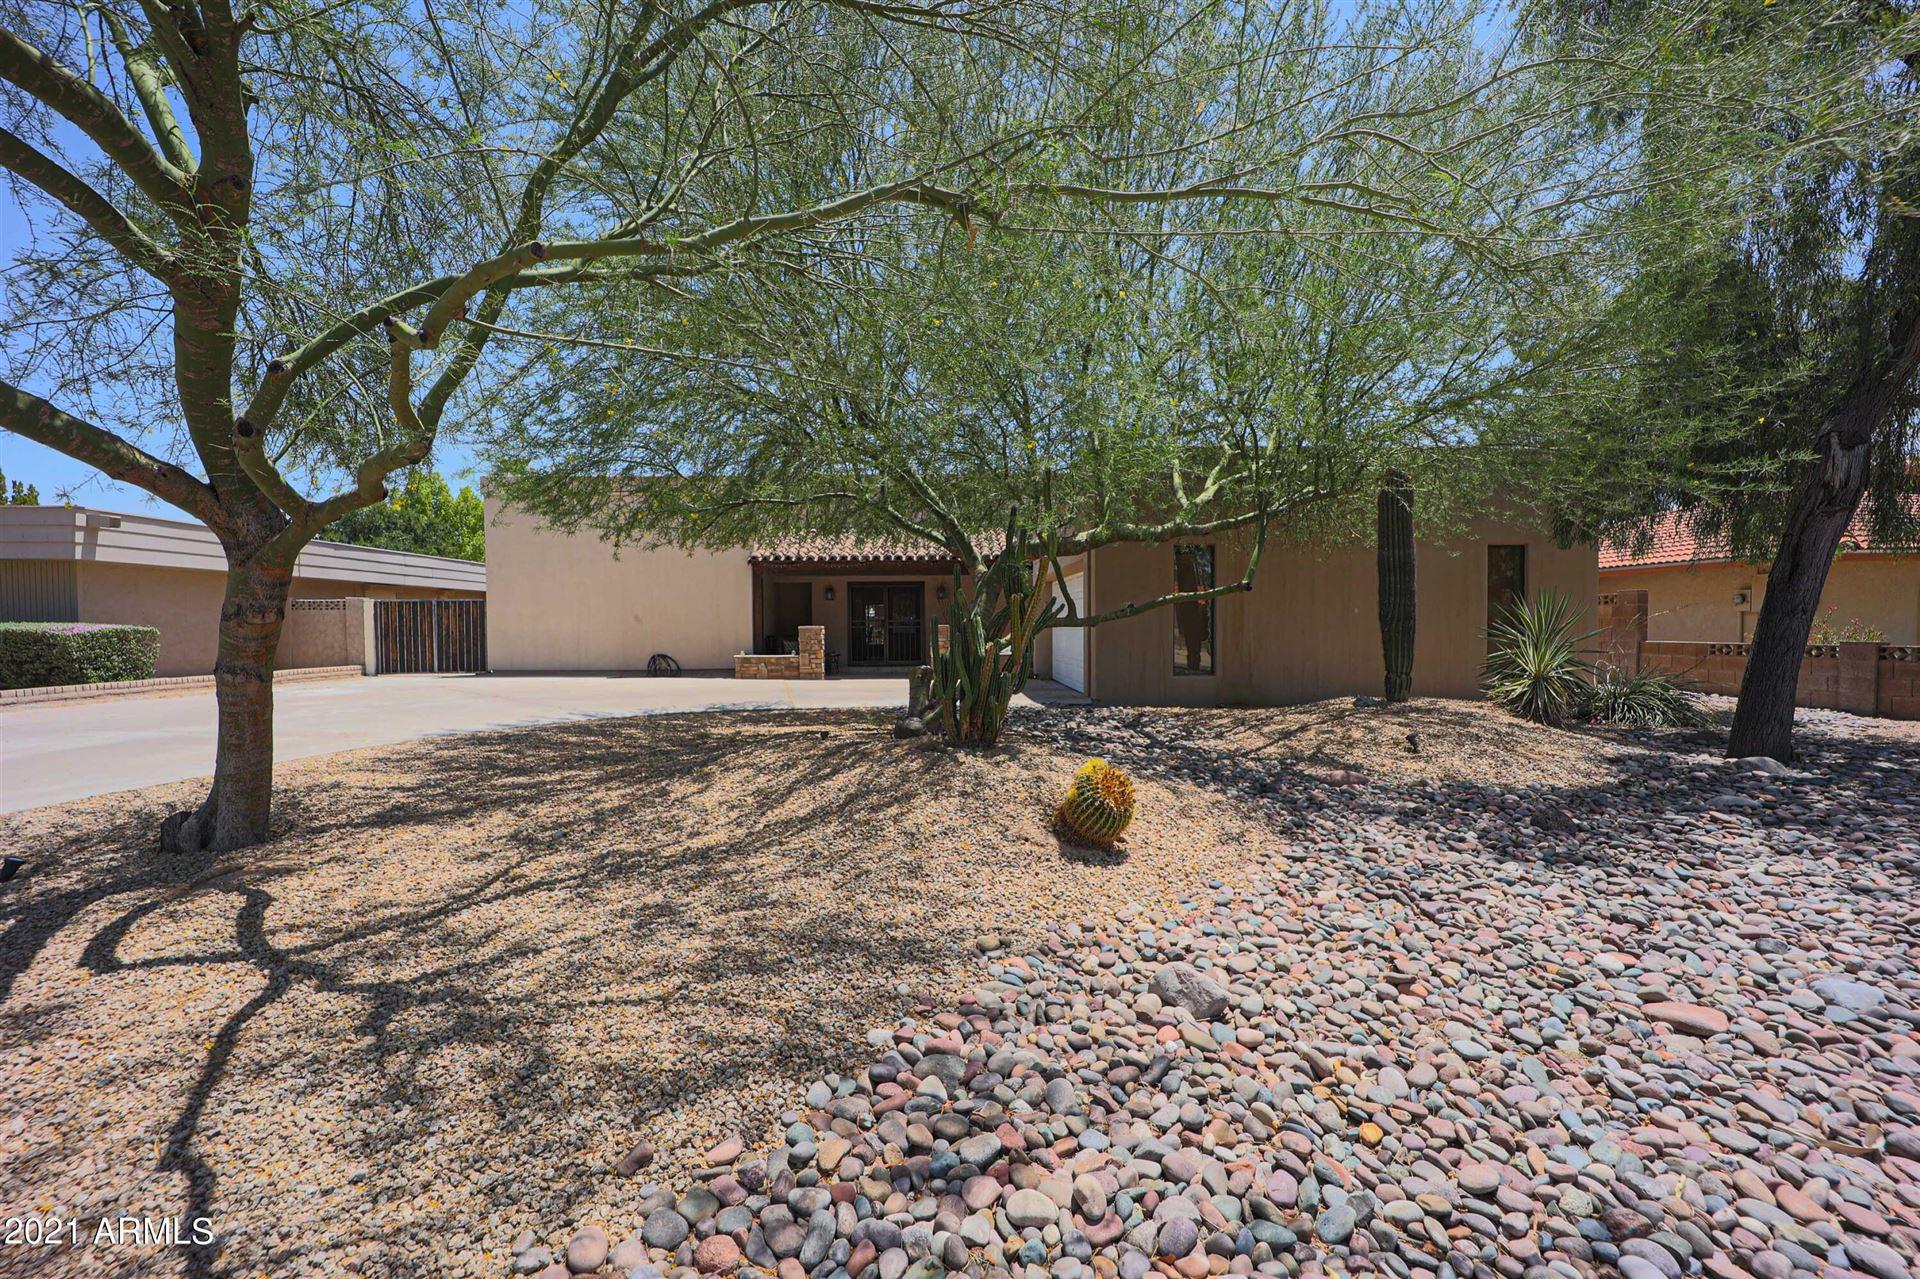 14633 N 3RD Avenue, Phoenix, AZ 85023 - MLS#: 6261719